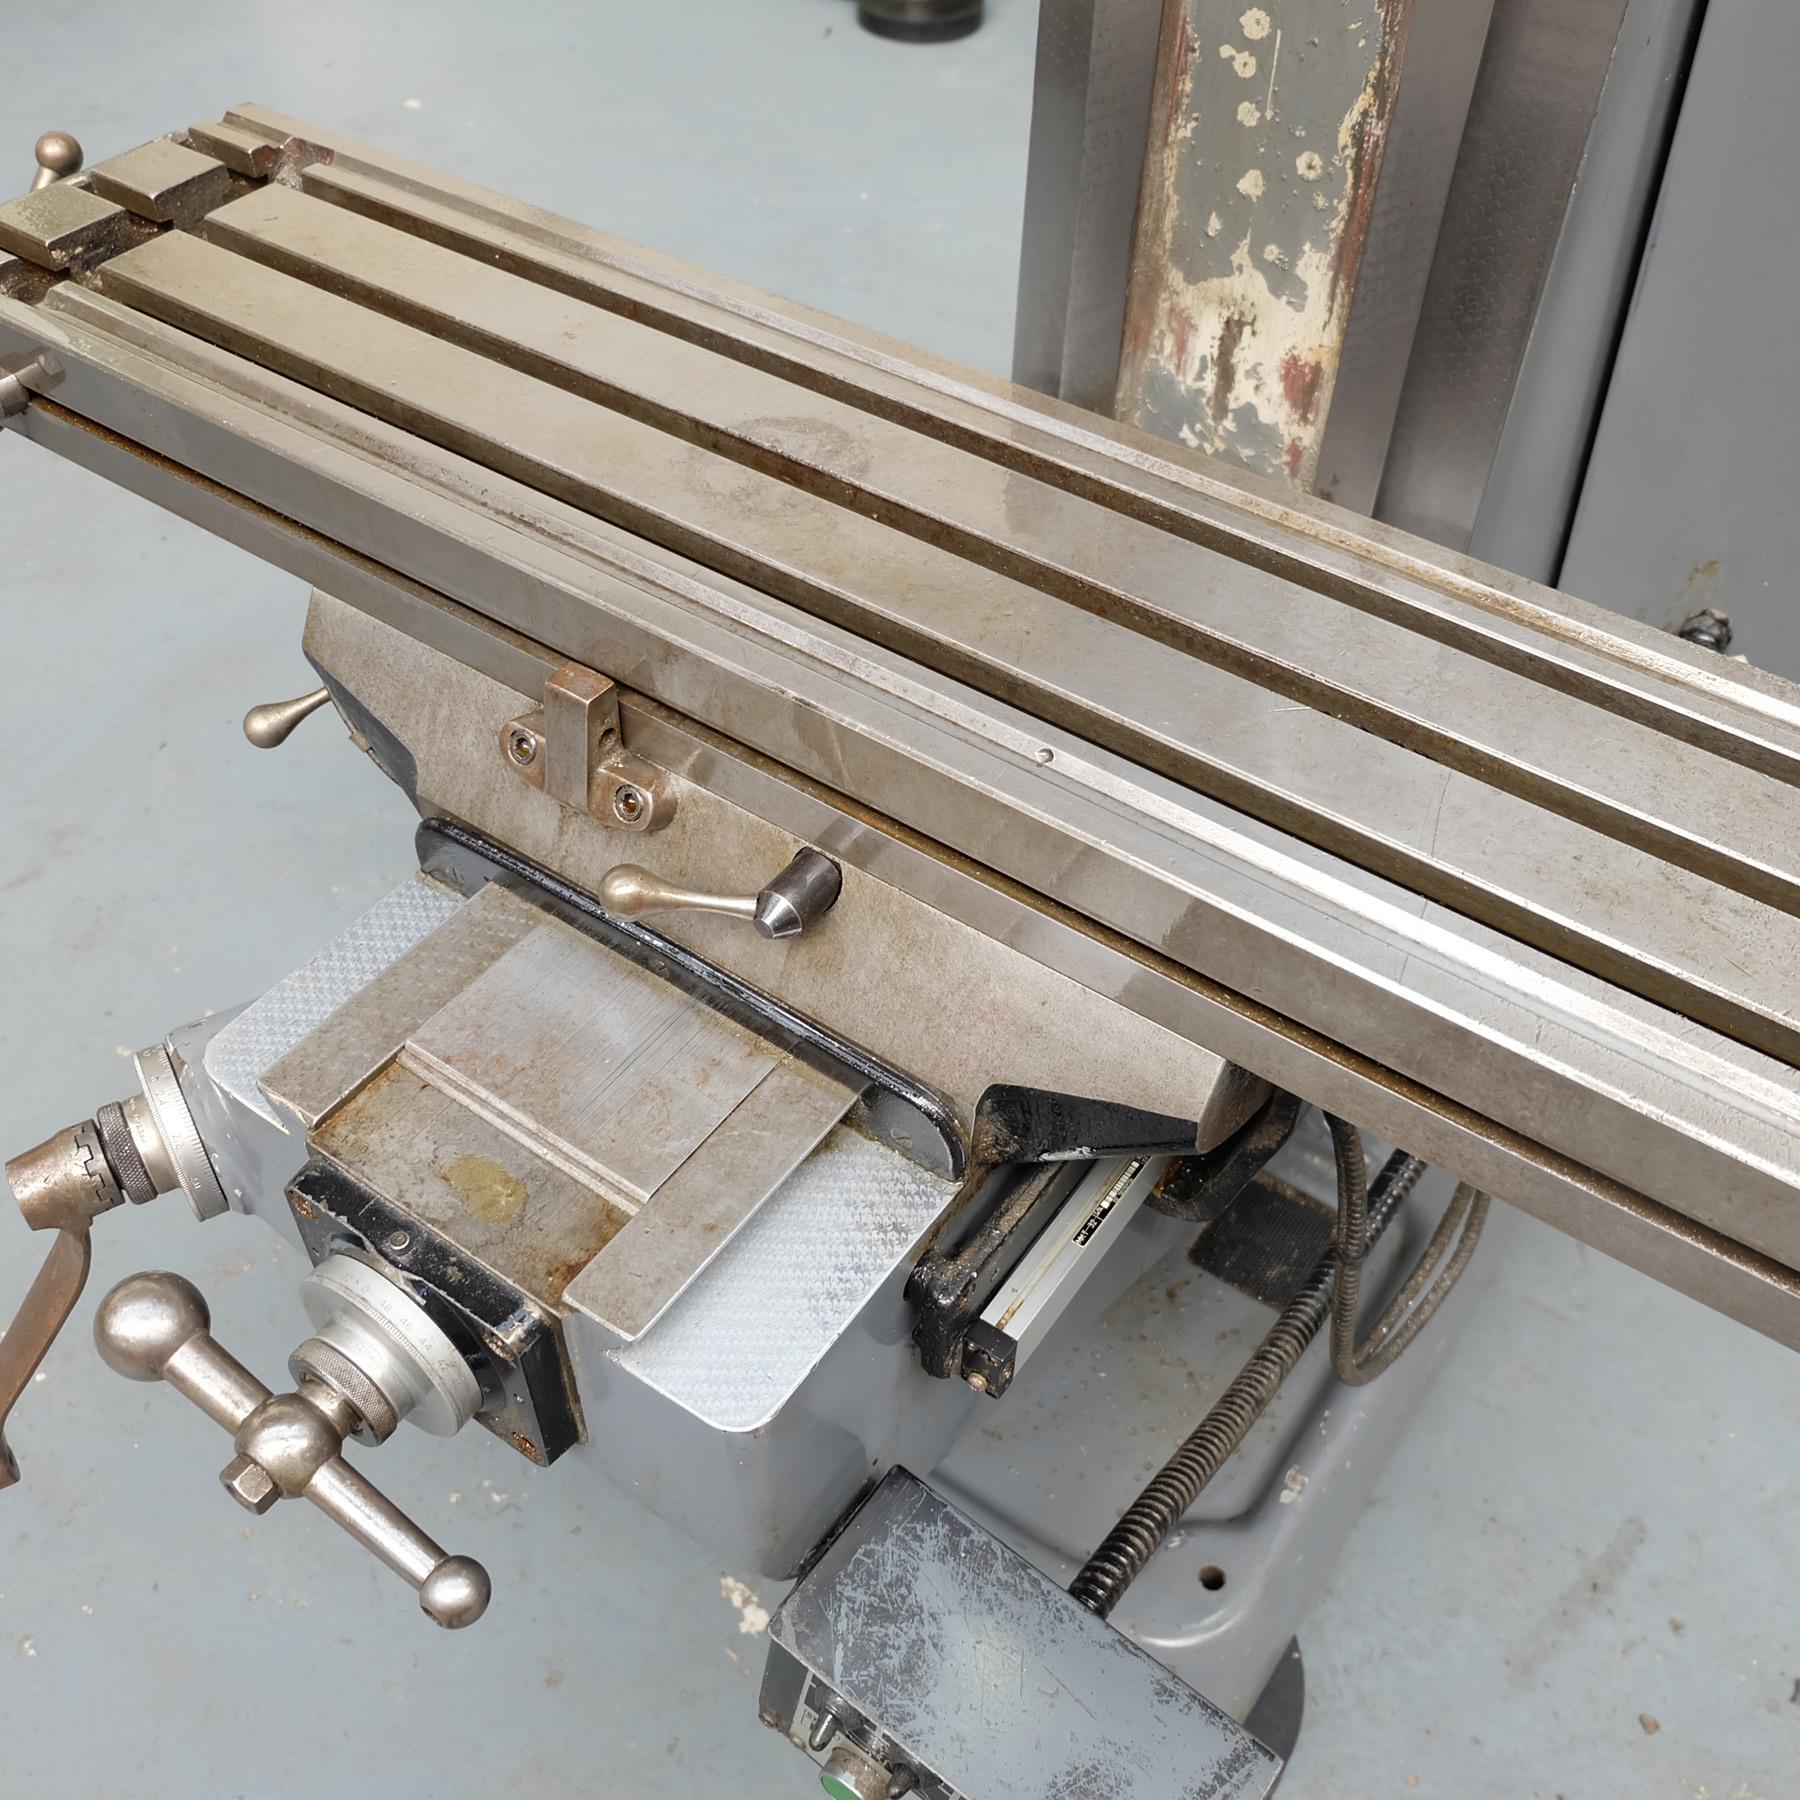 "Bridgeport J Type Turret Miller. Table Size 42"" x 9"". - Image 7 of 13"